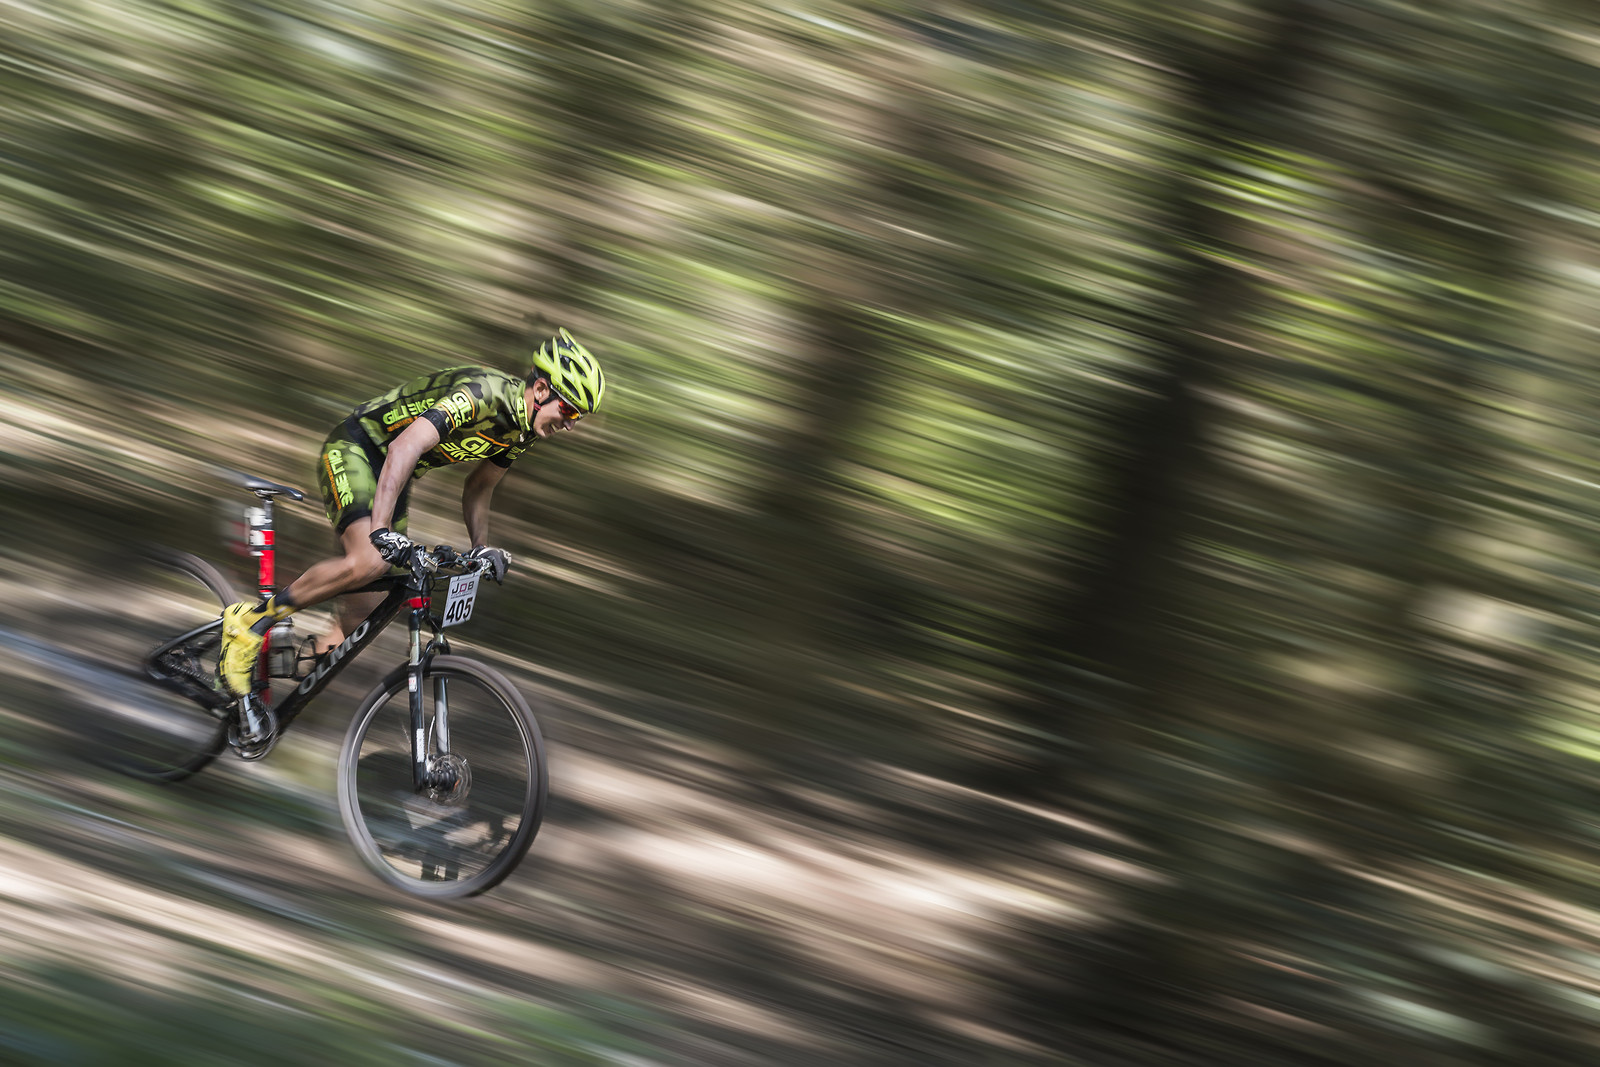 cross country race - mcirig - Mountain Biking Pictures - Vital MTB